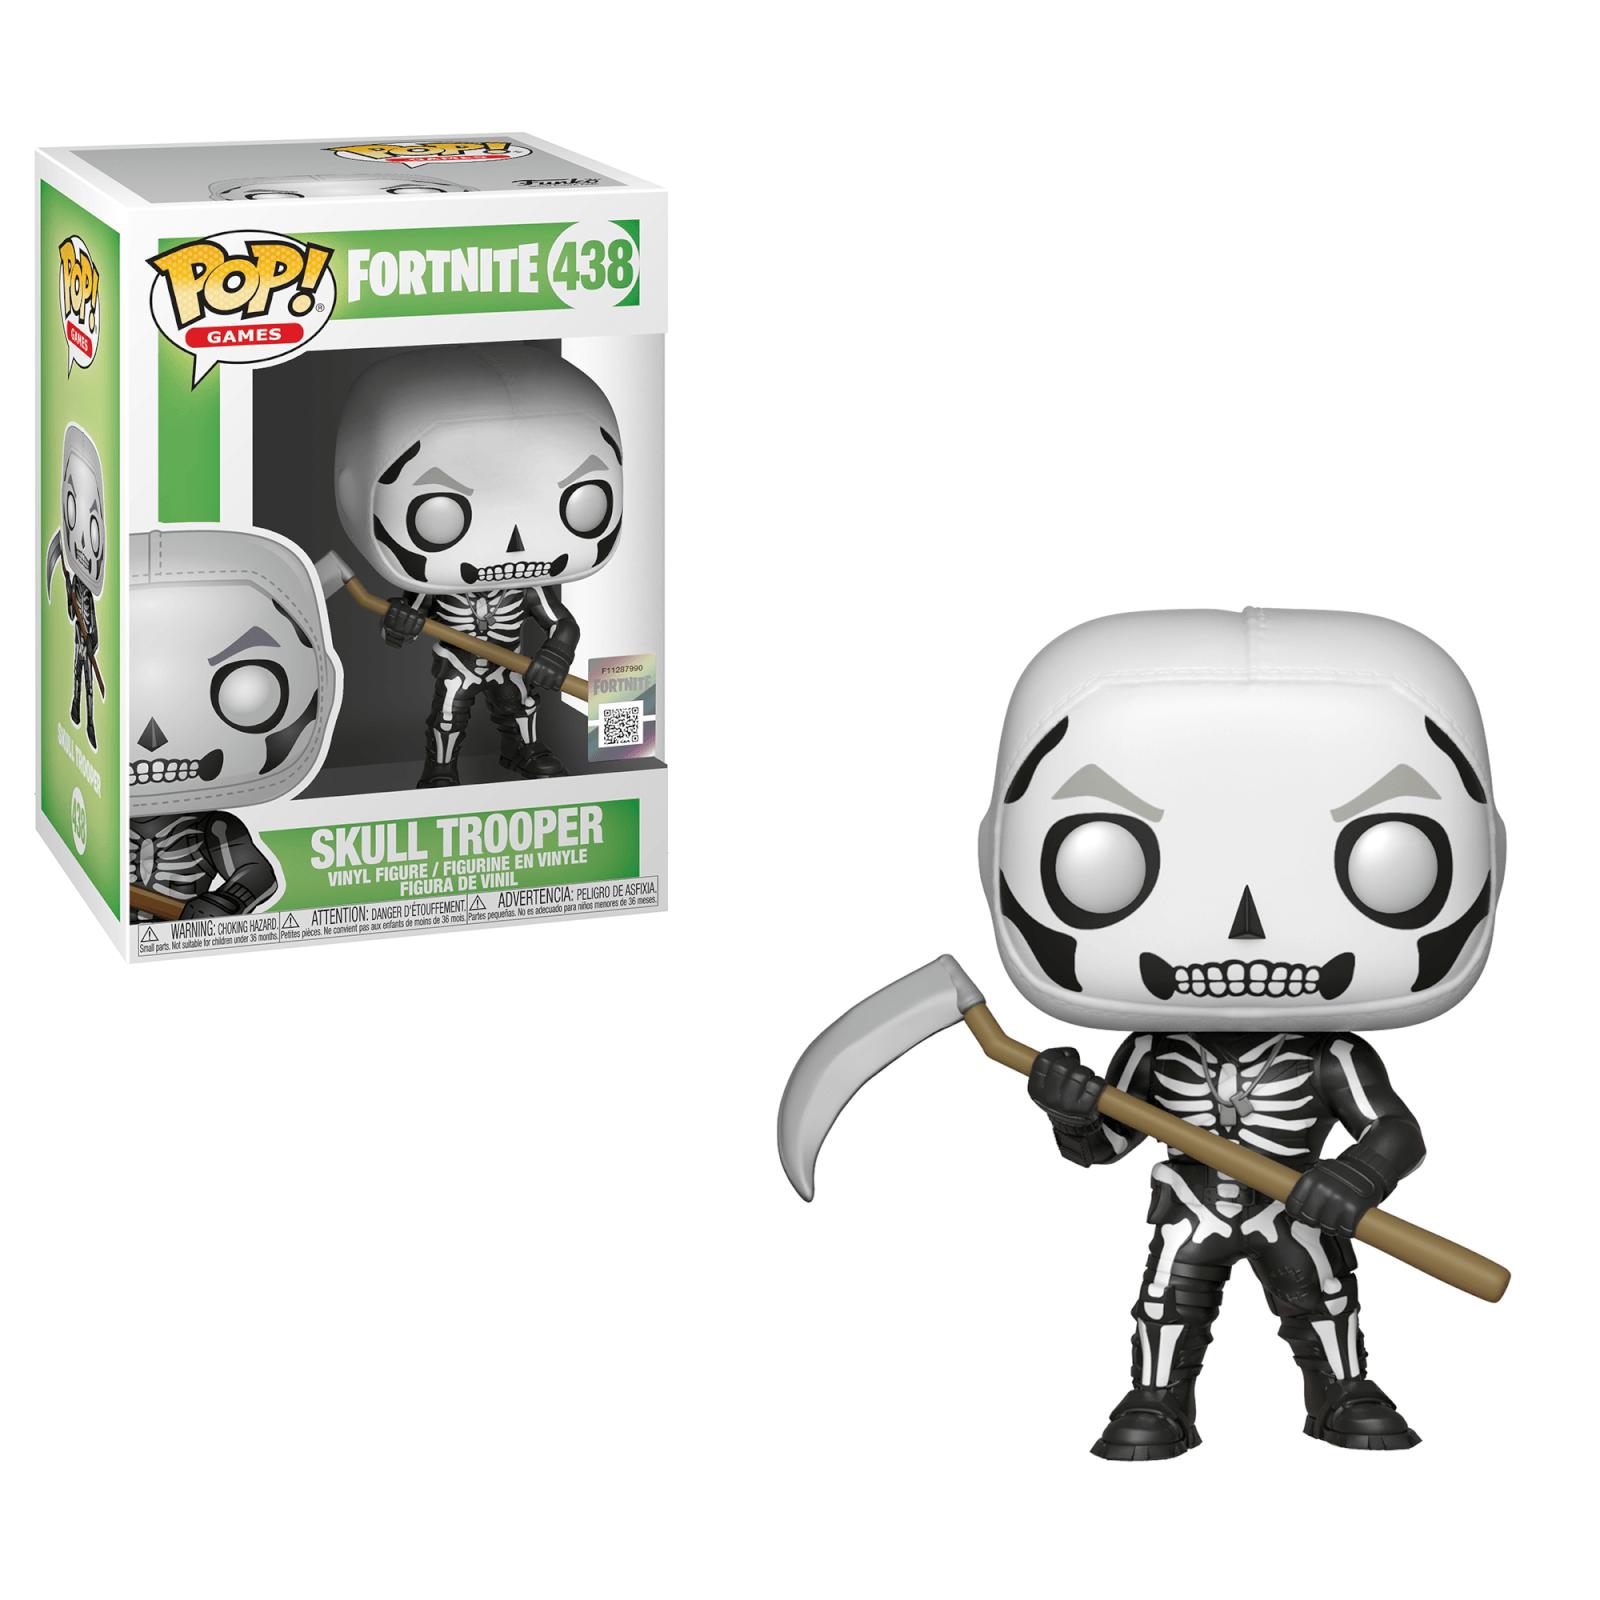 Fortnite Skull Trooper Pop! Vinyl Figure £3.99 @ Pop In A Box (£2.99 P&P)